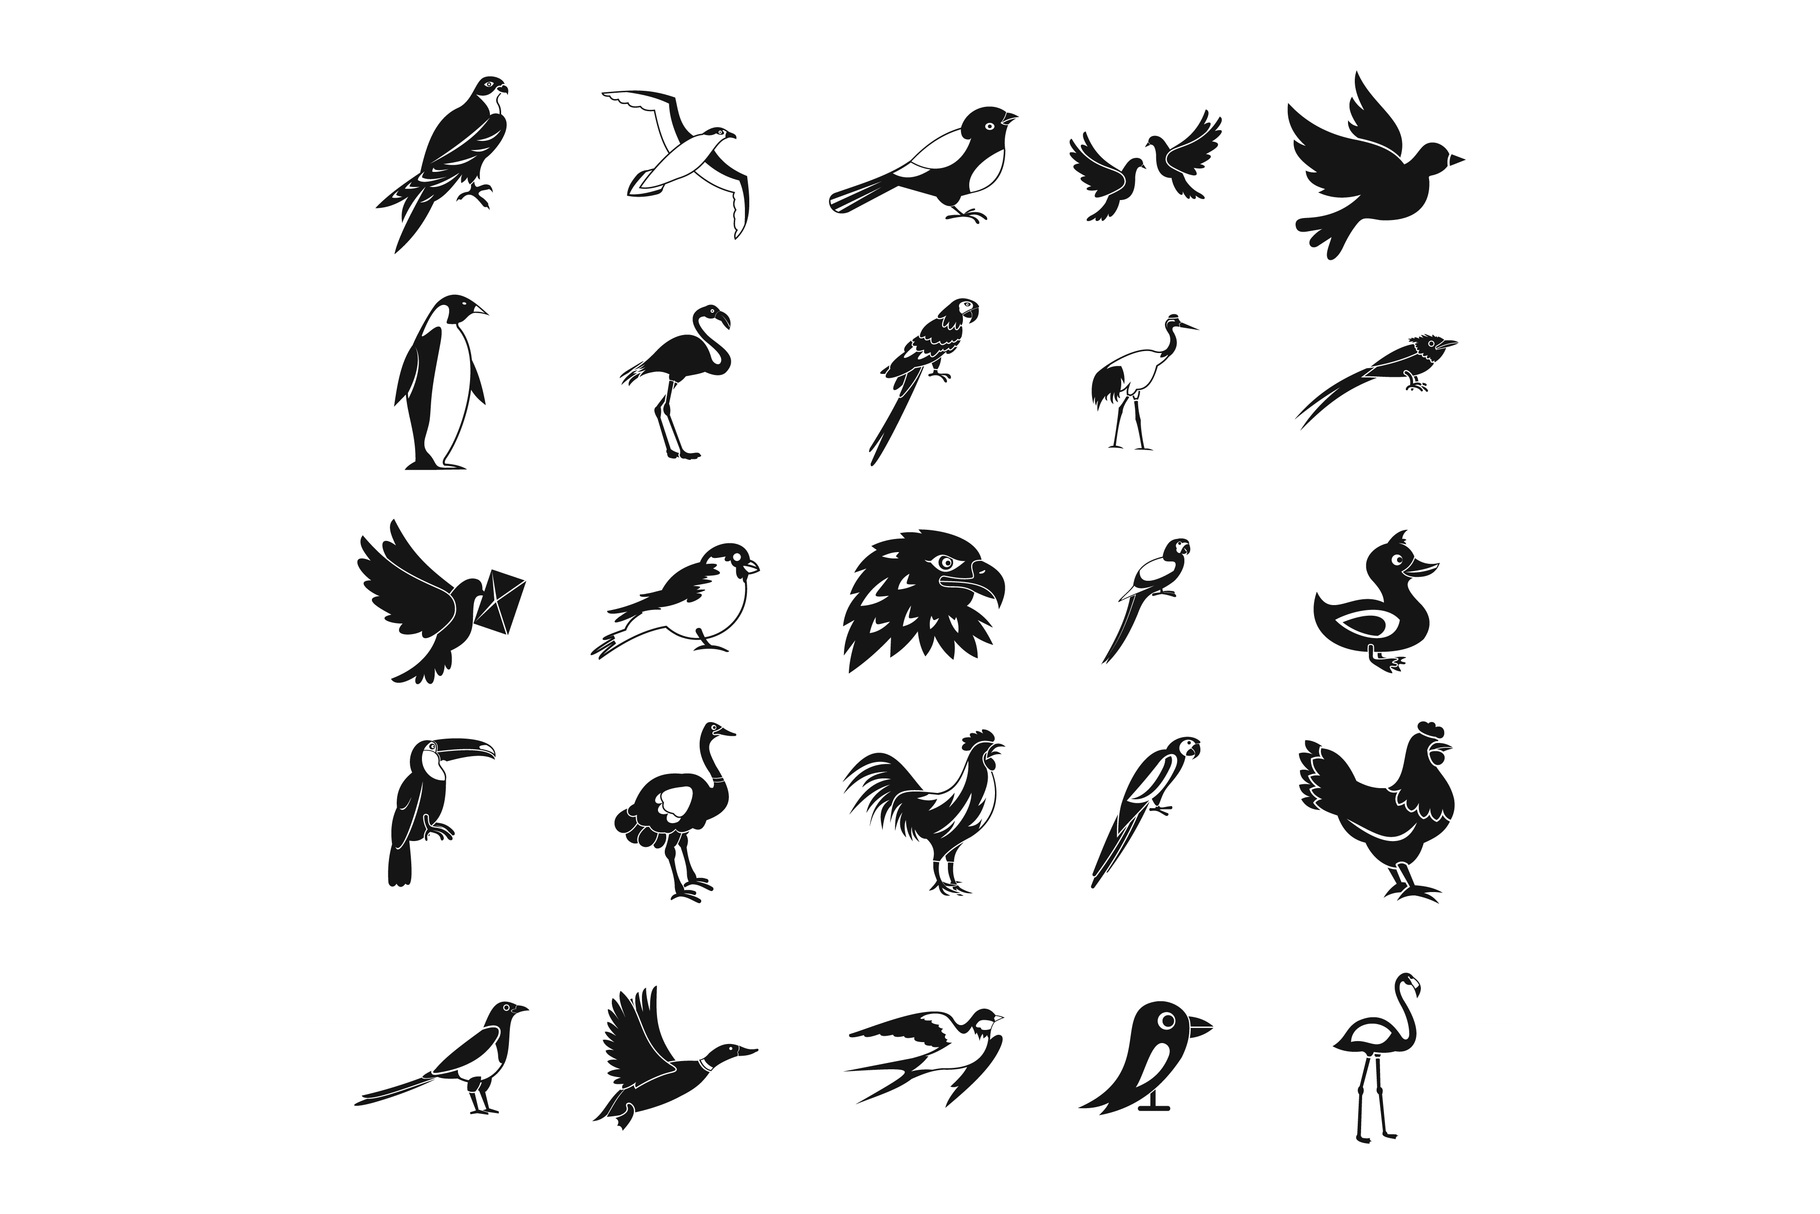 Birds icon set, simple style example image 1